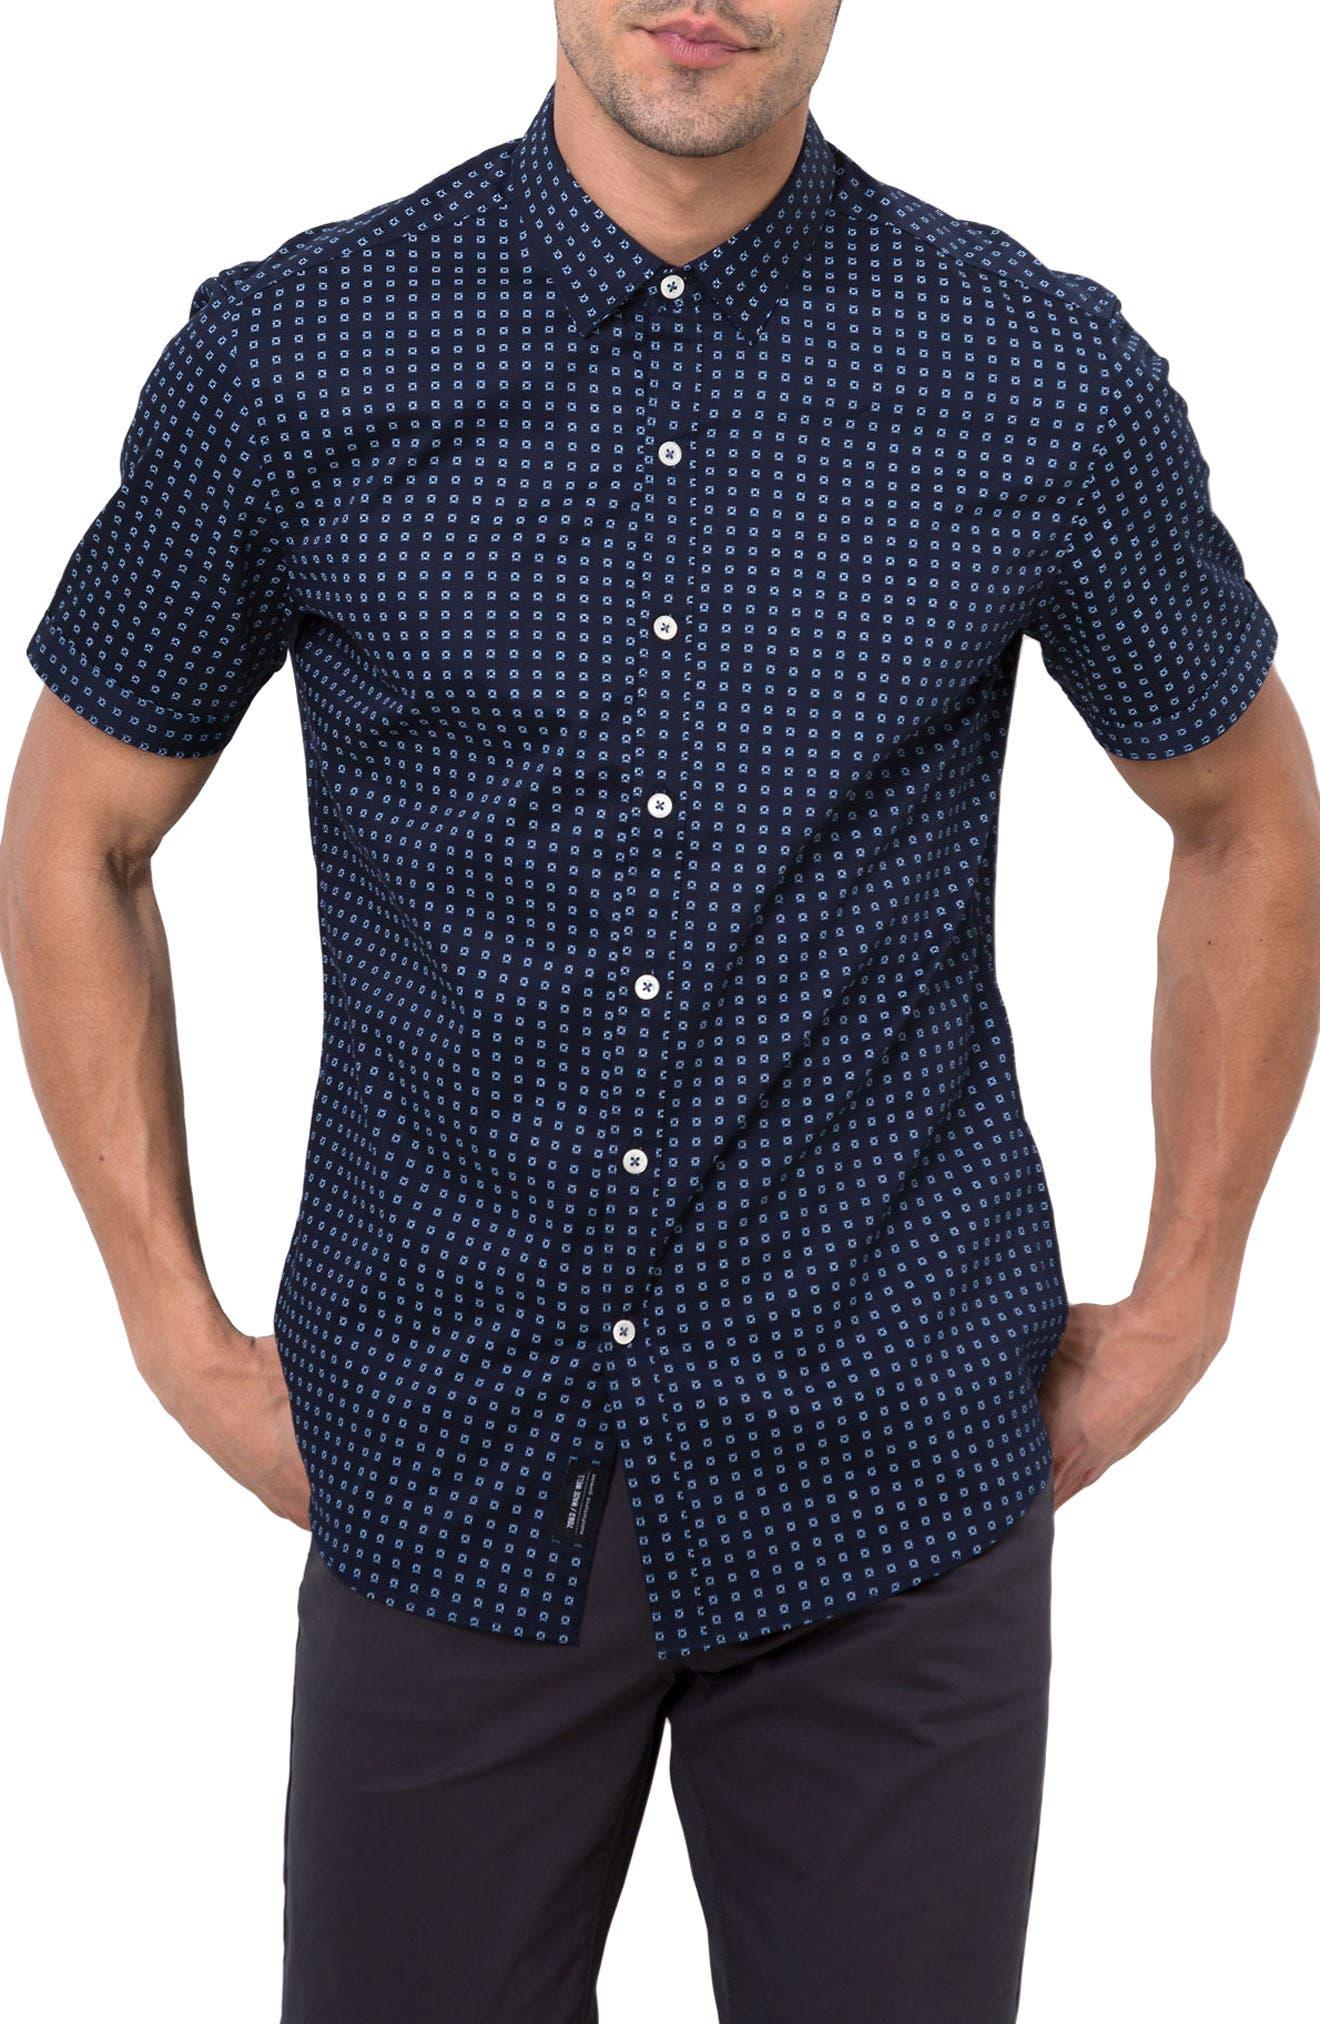 7 Diamonds Professor Rhythm Jacquard Woven Shirt